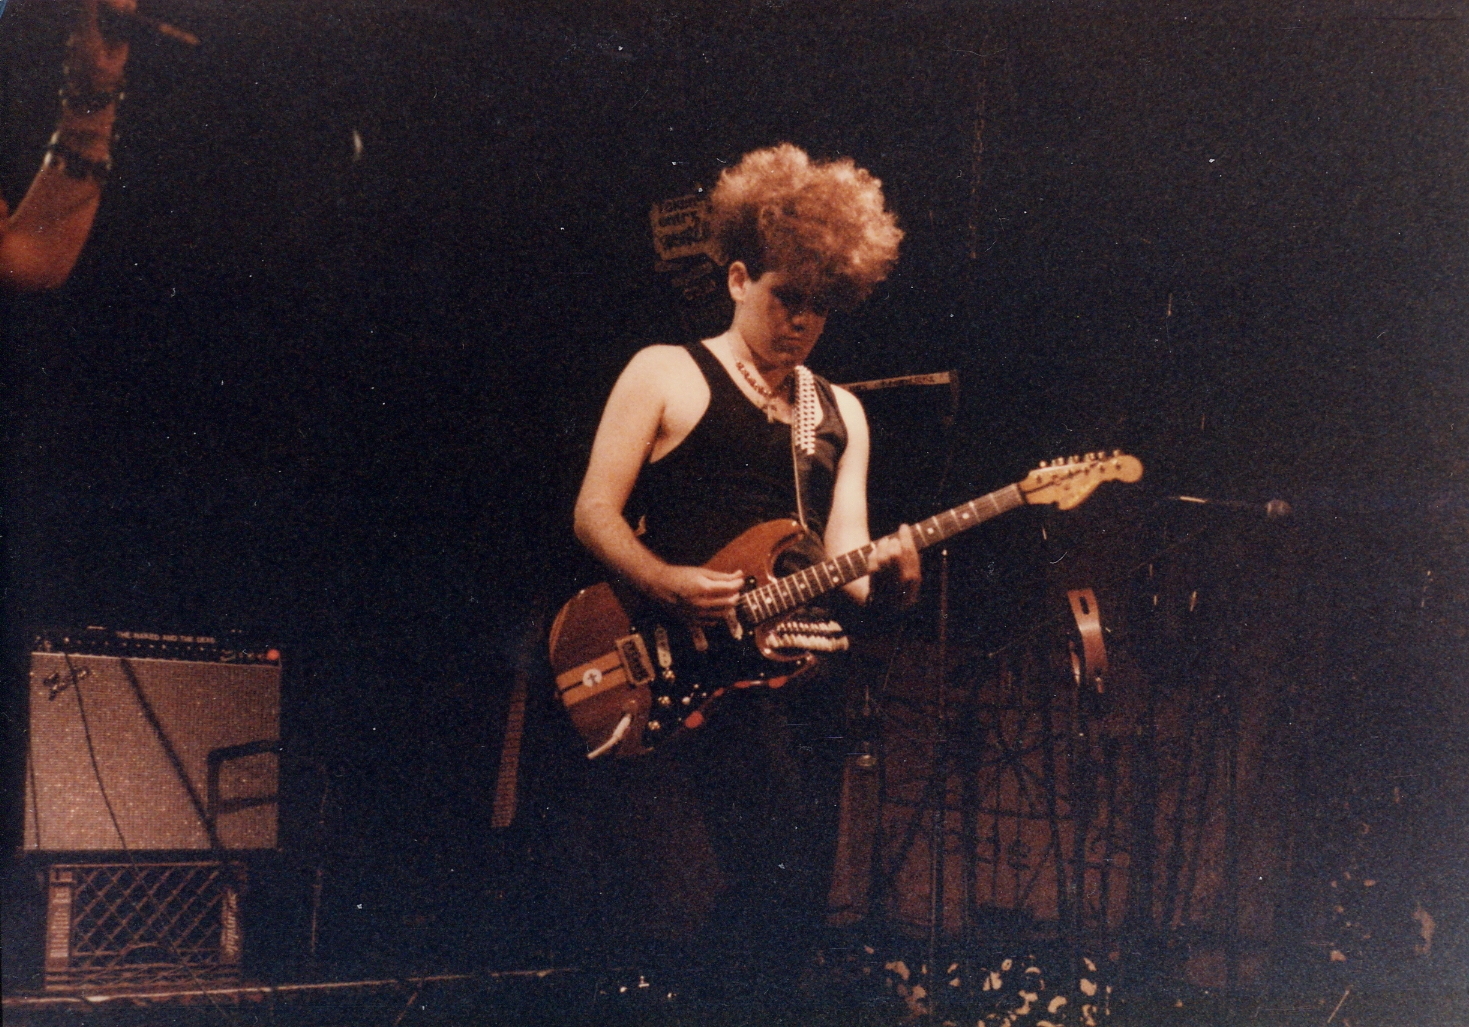 1985-08-12 (33)